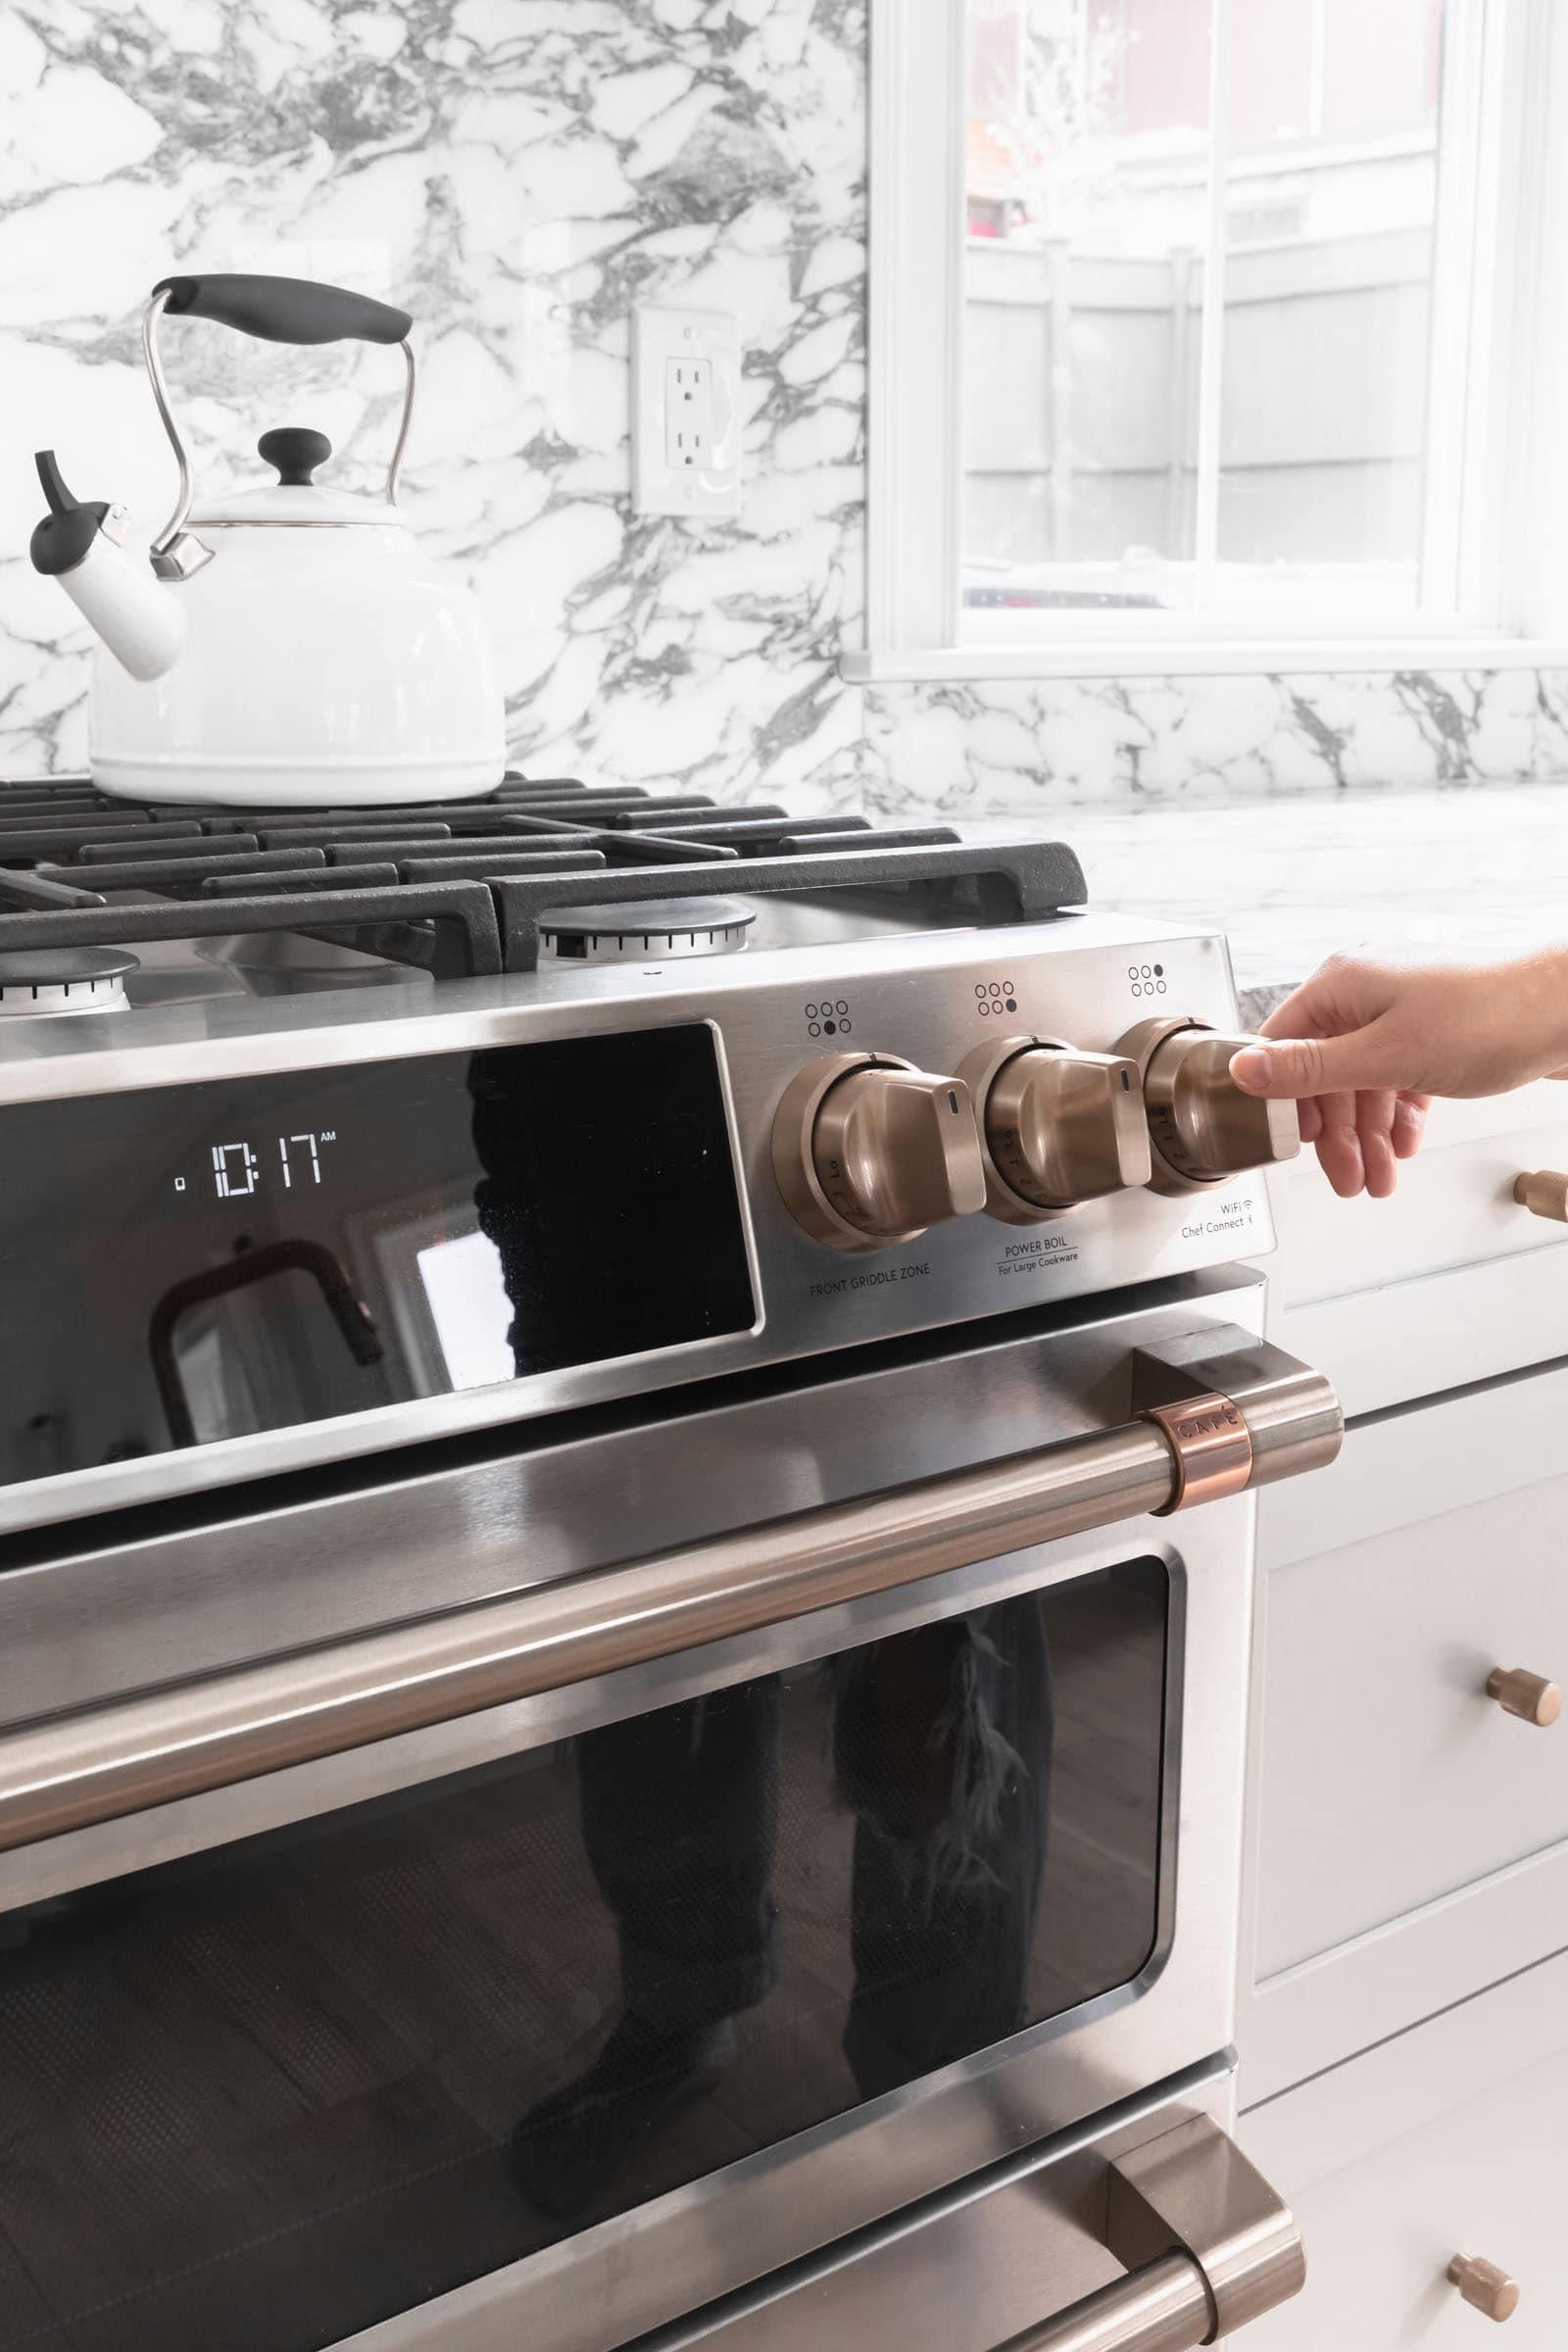 turning on stove